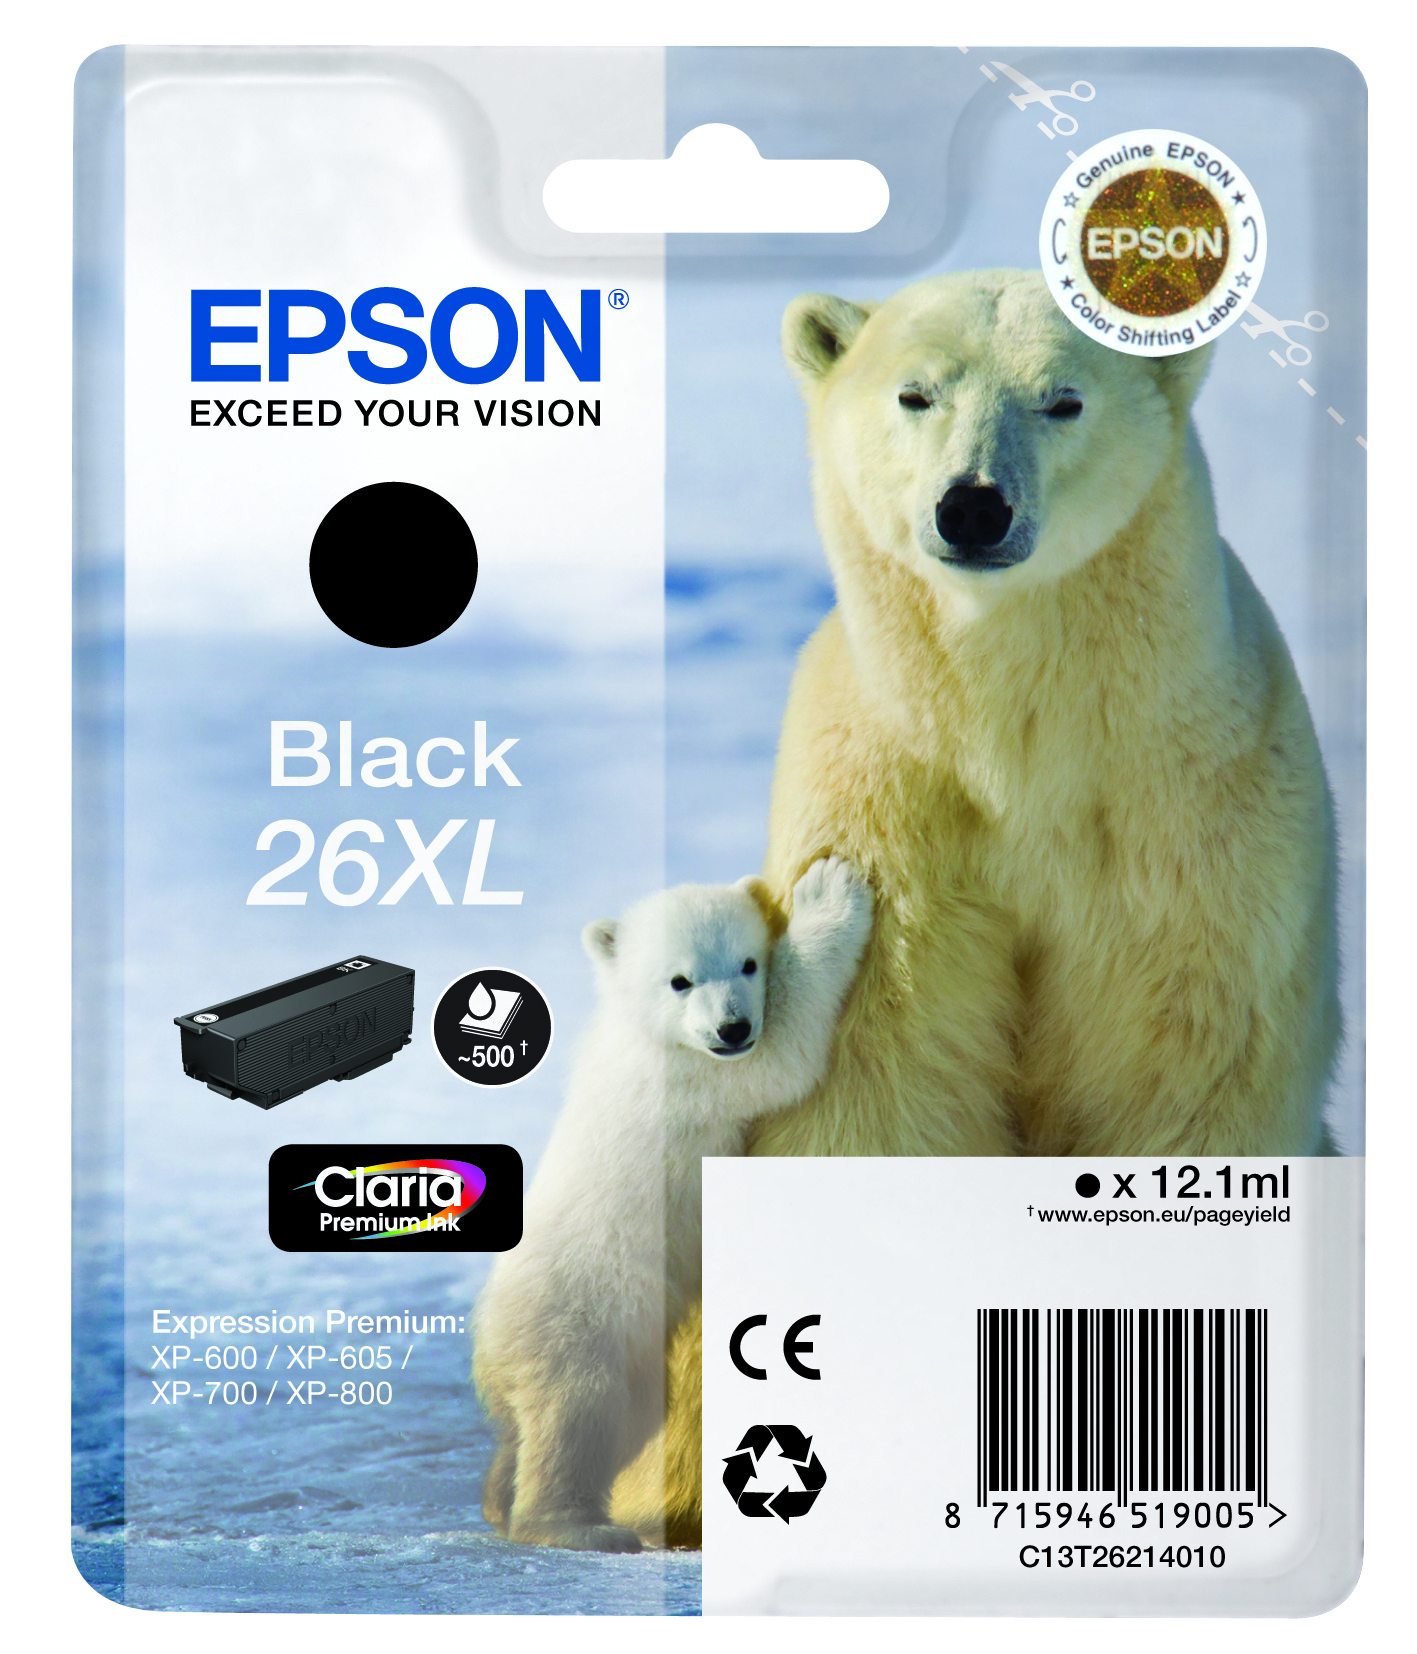 Epson Original 26XL Black Ink (Polar Bear)